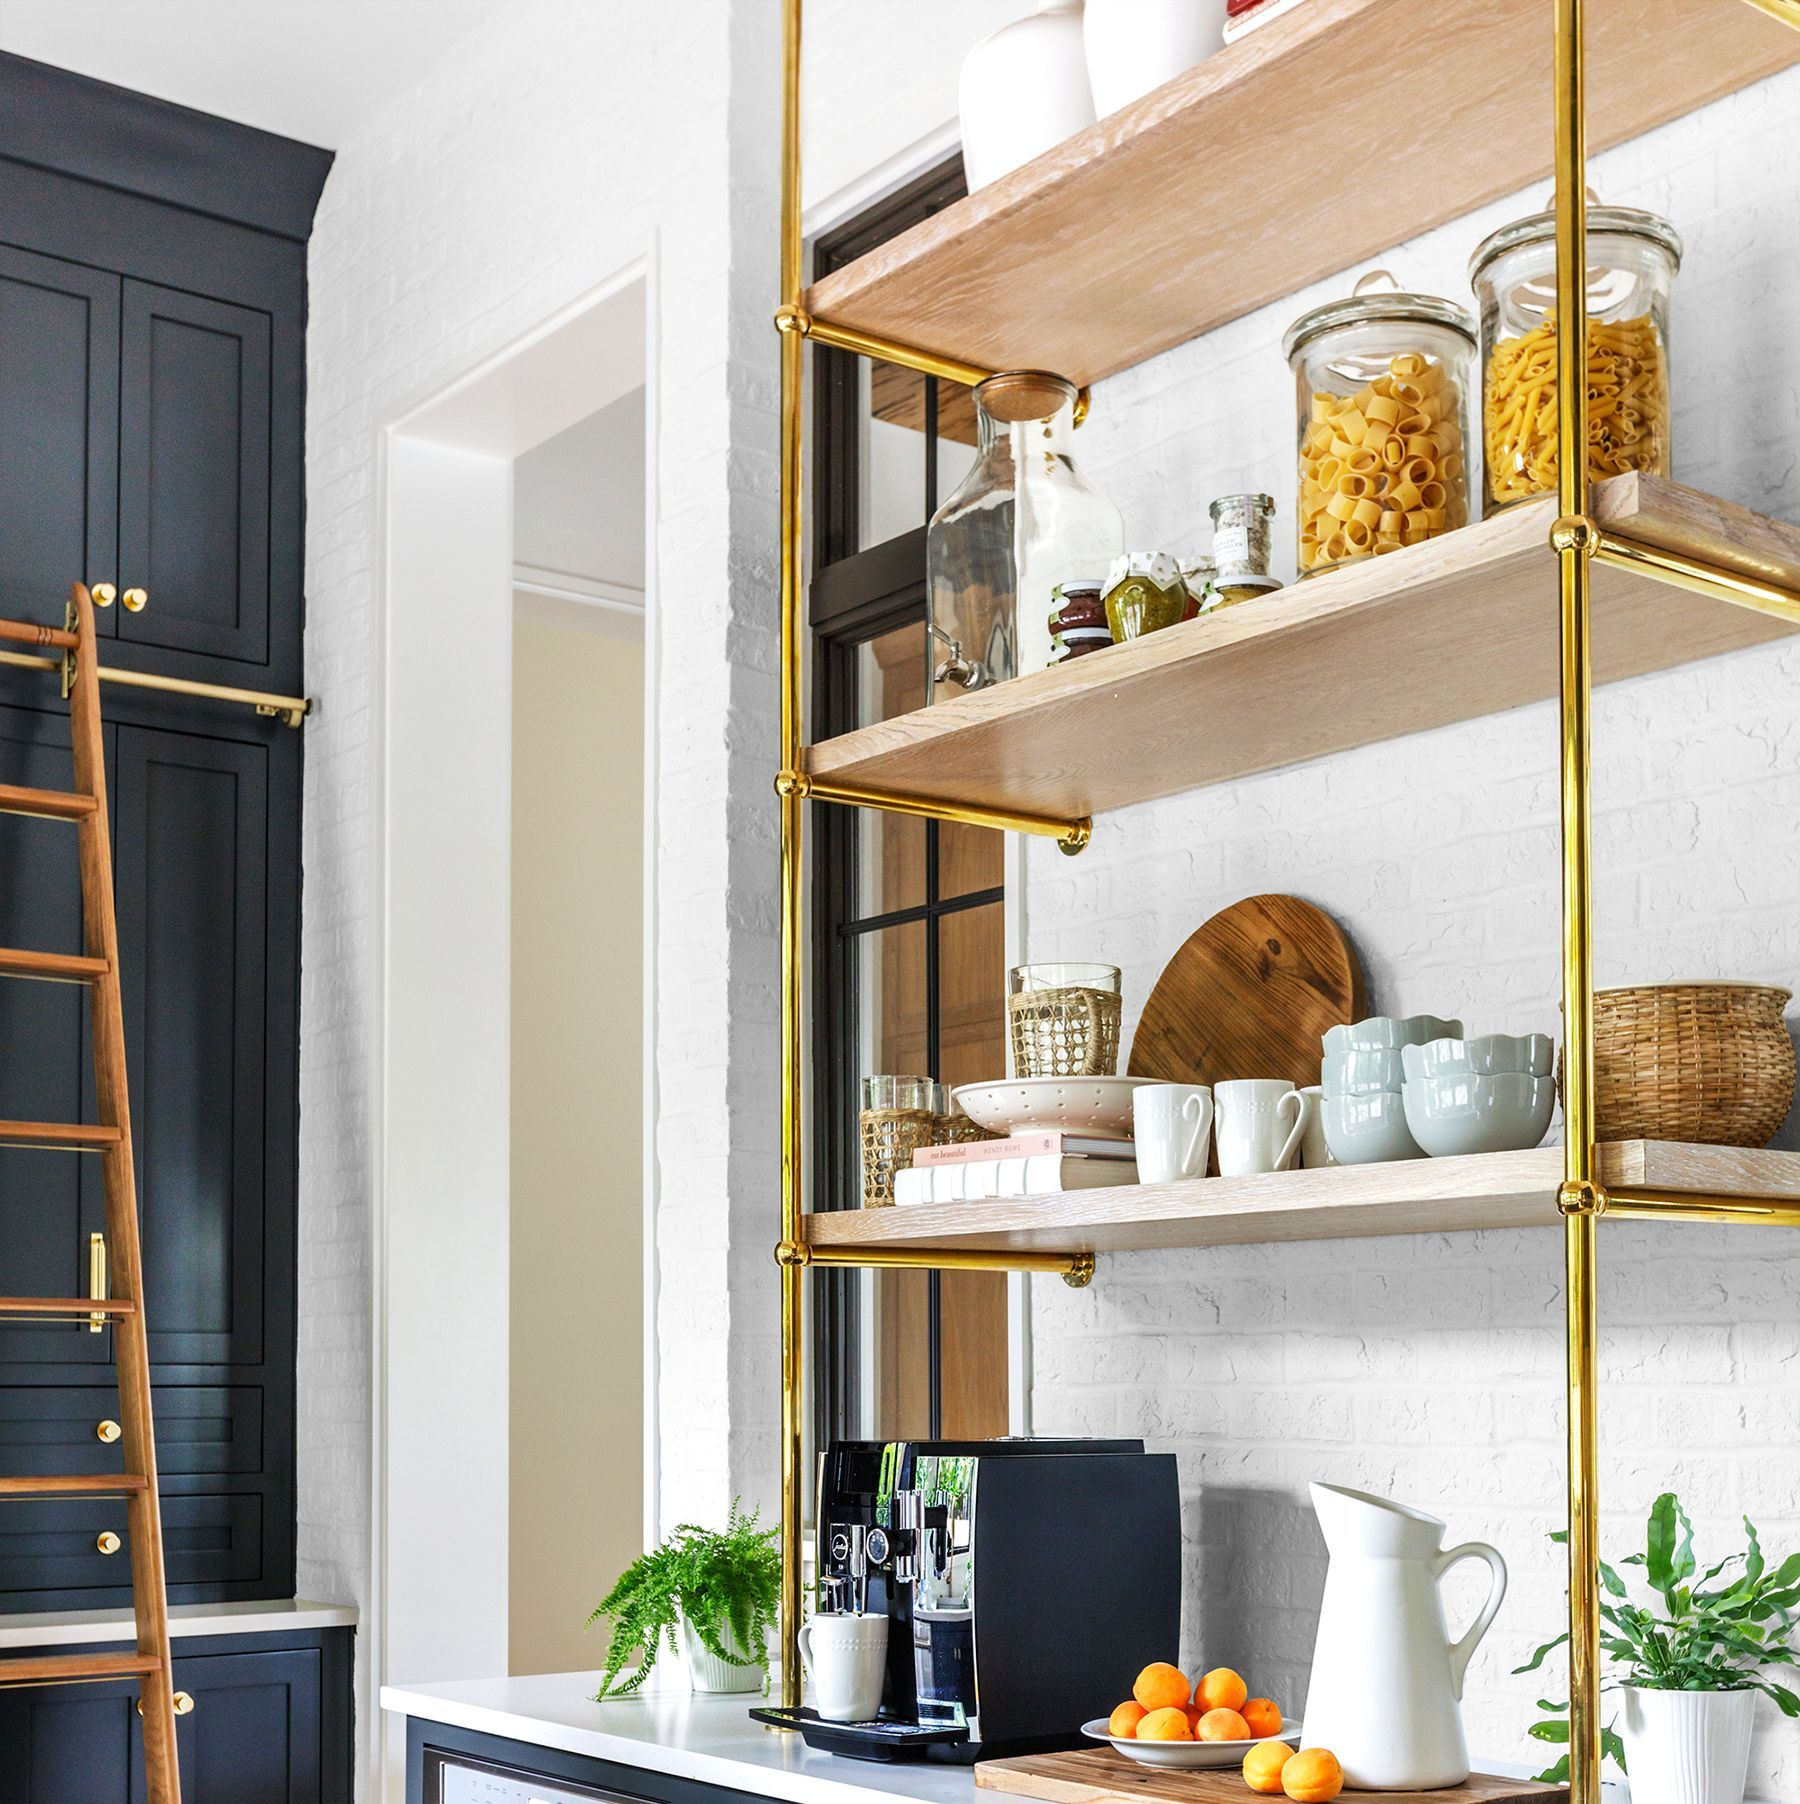 10 Unique Small Kitchen Design Ideas: Game-Changing Kitchen Storage Ideas No Matter What Size